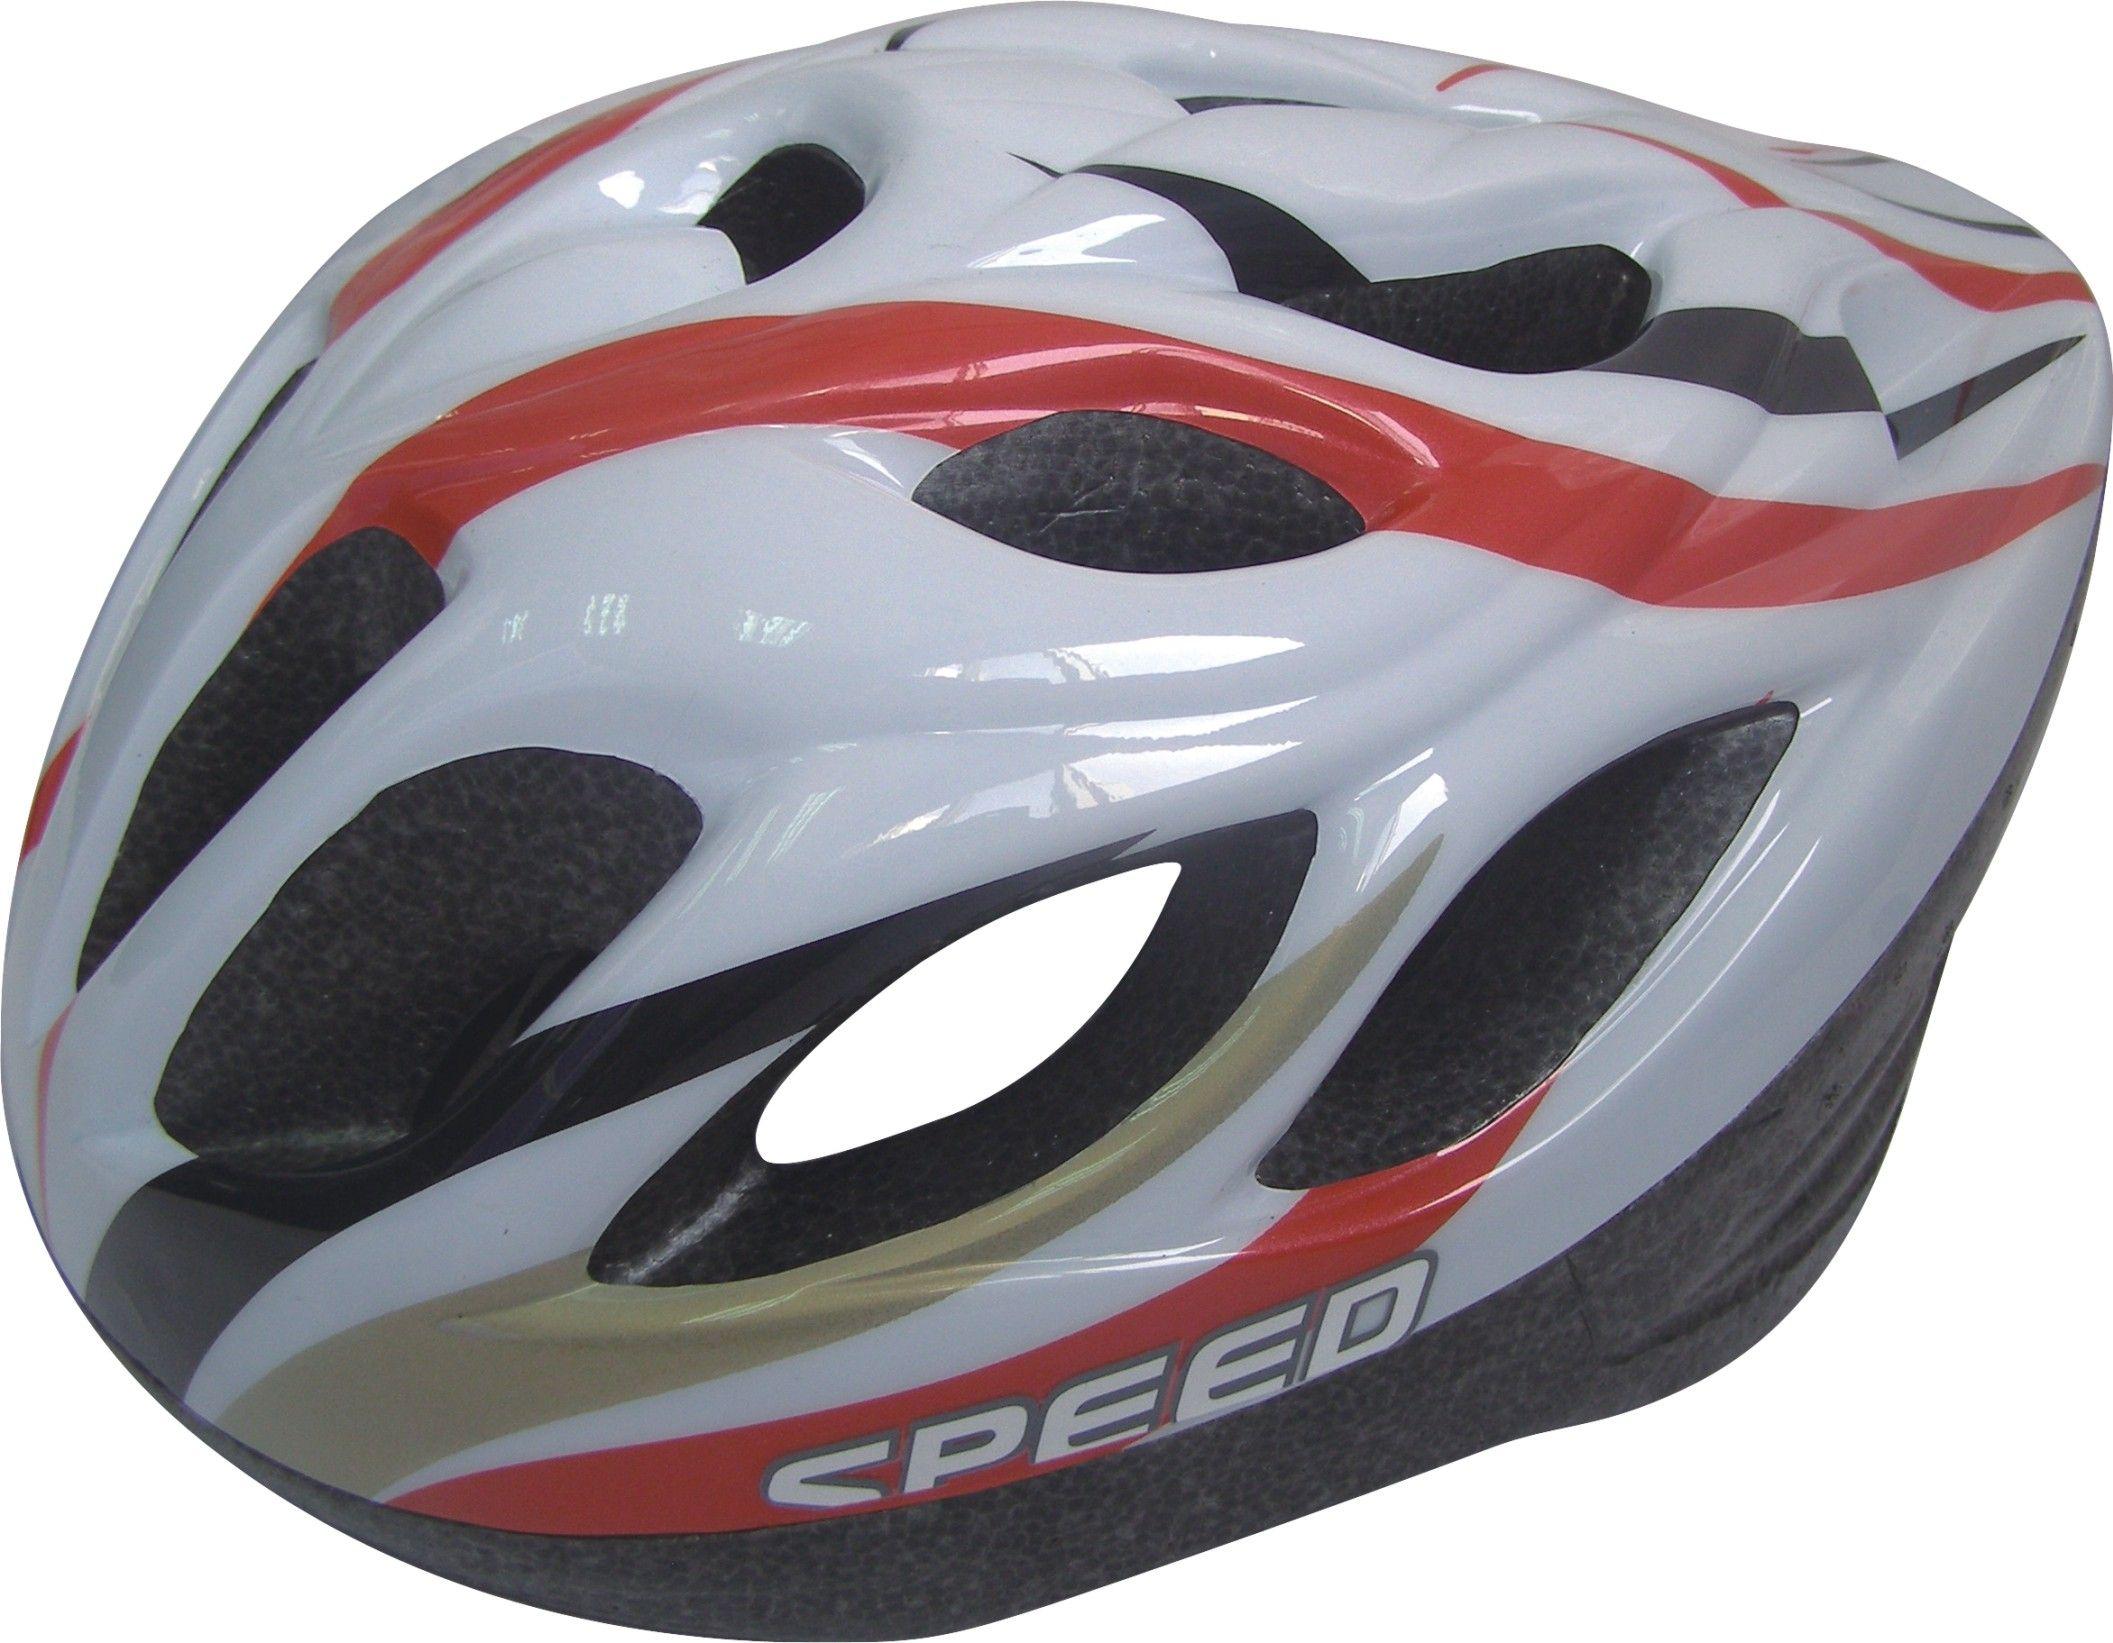 Вело Шлем Senhai PW-910-17 р.M (55-58см) регулир. застежка от Ravta